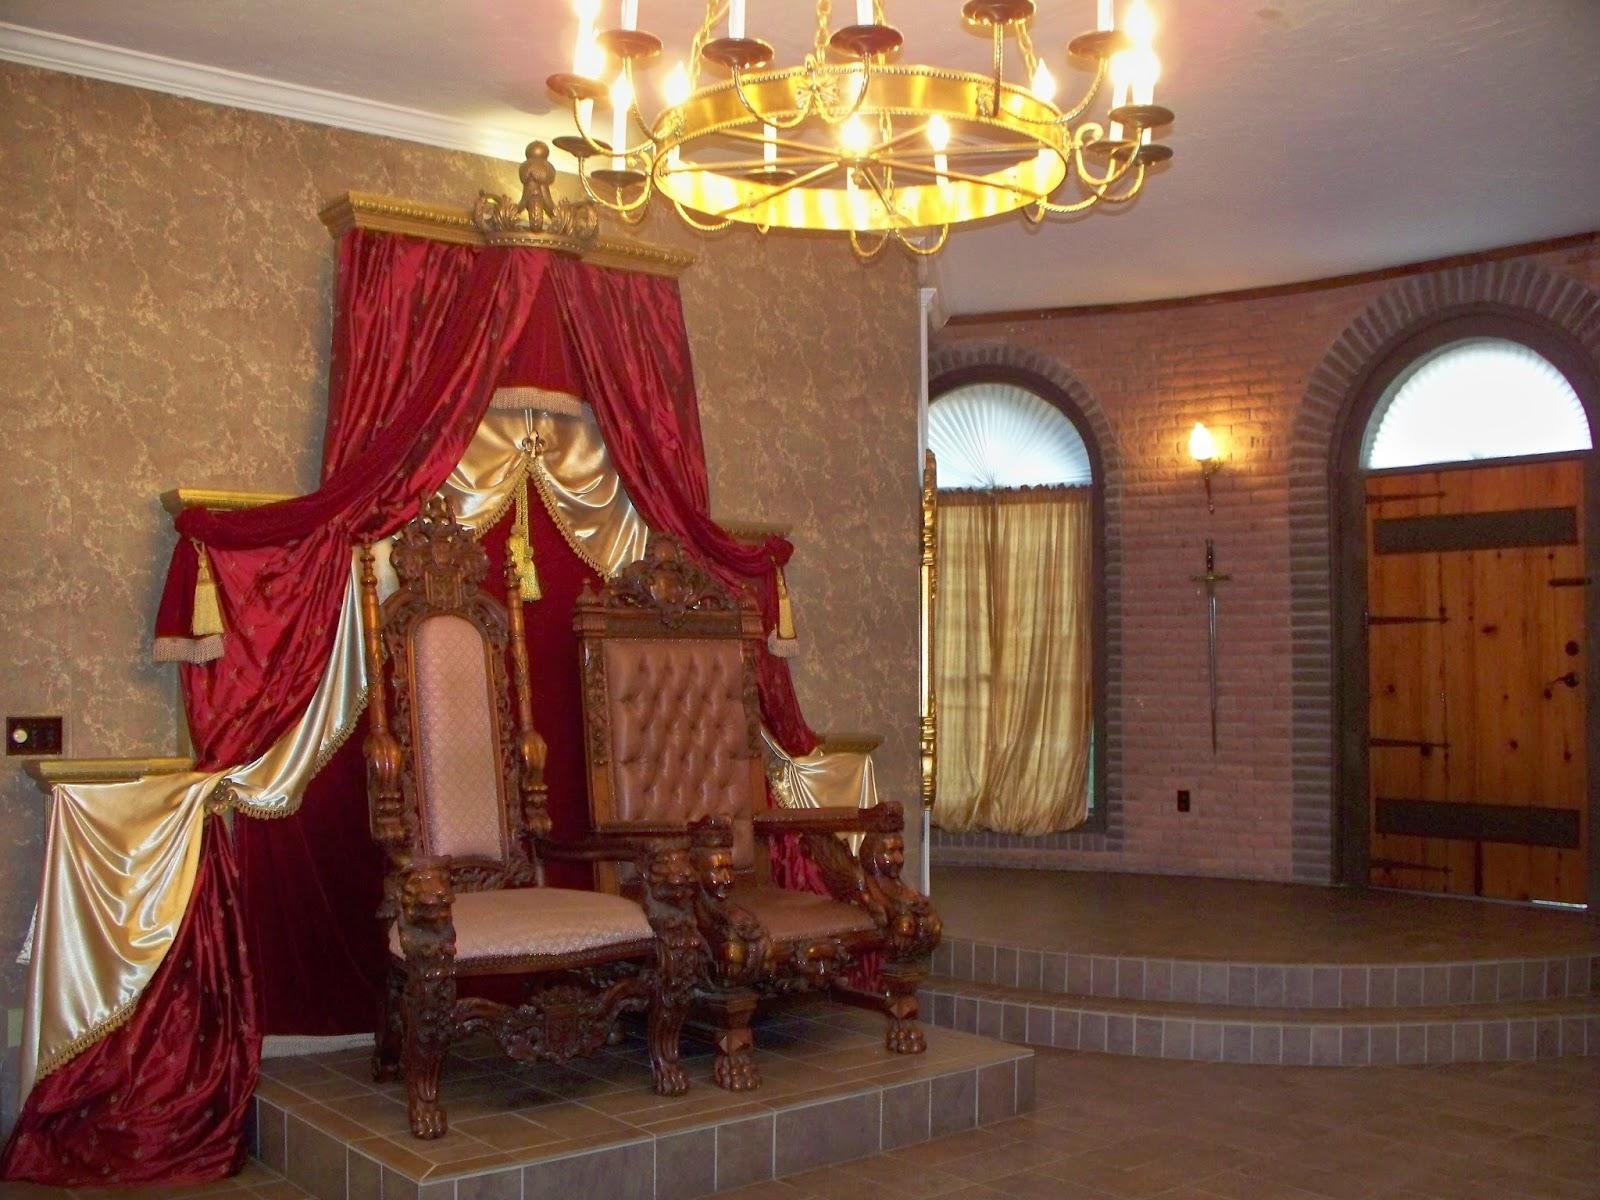 The Louisiana Castle Tour